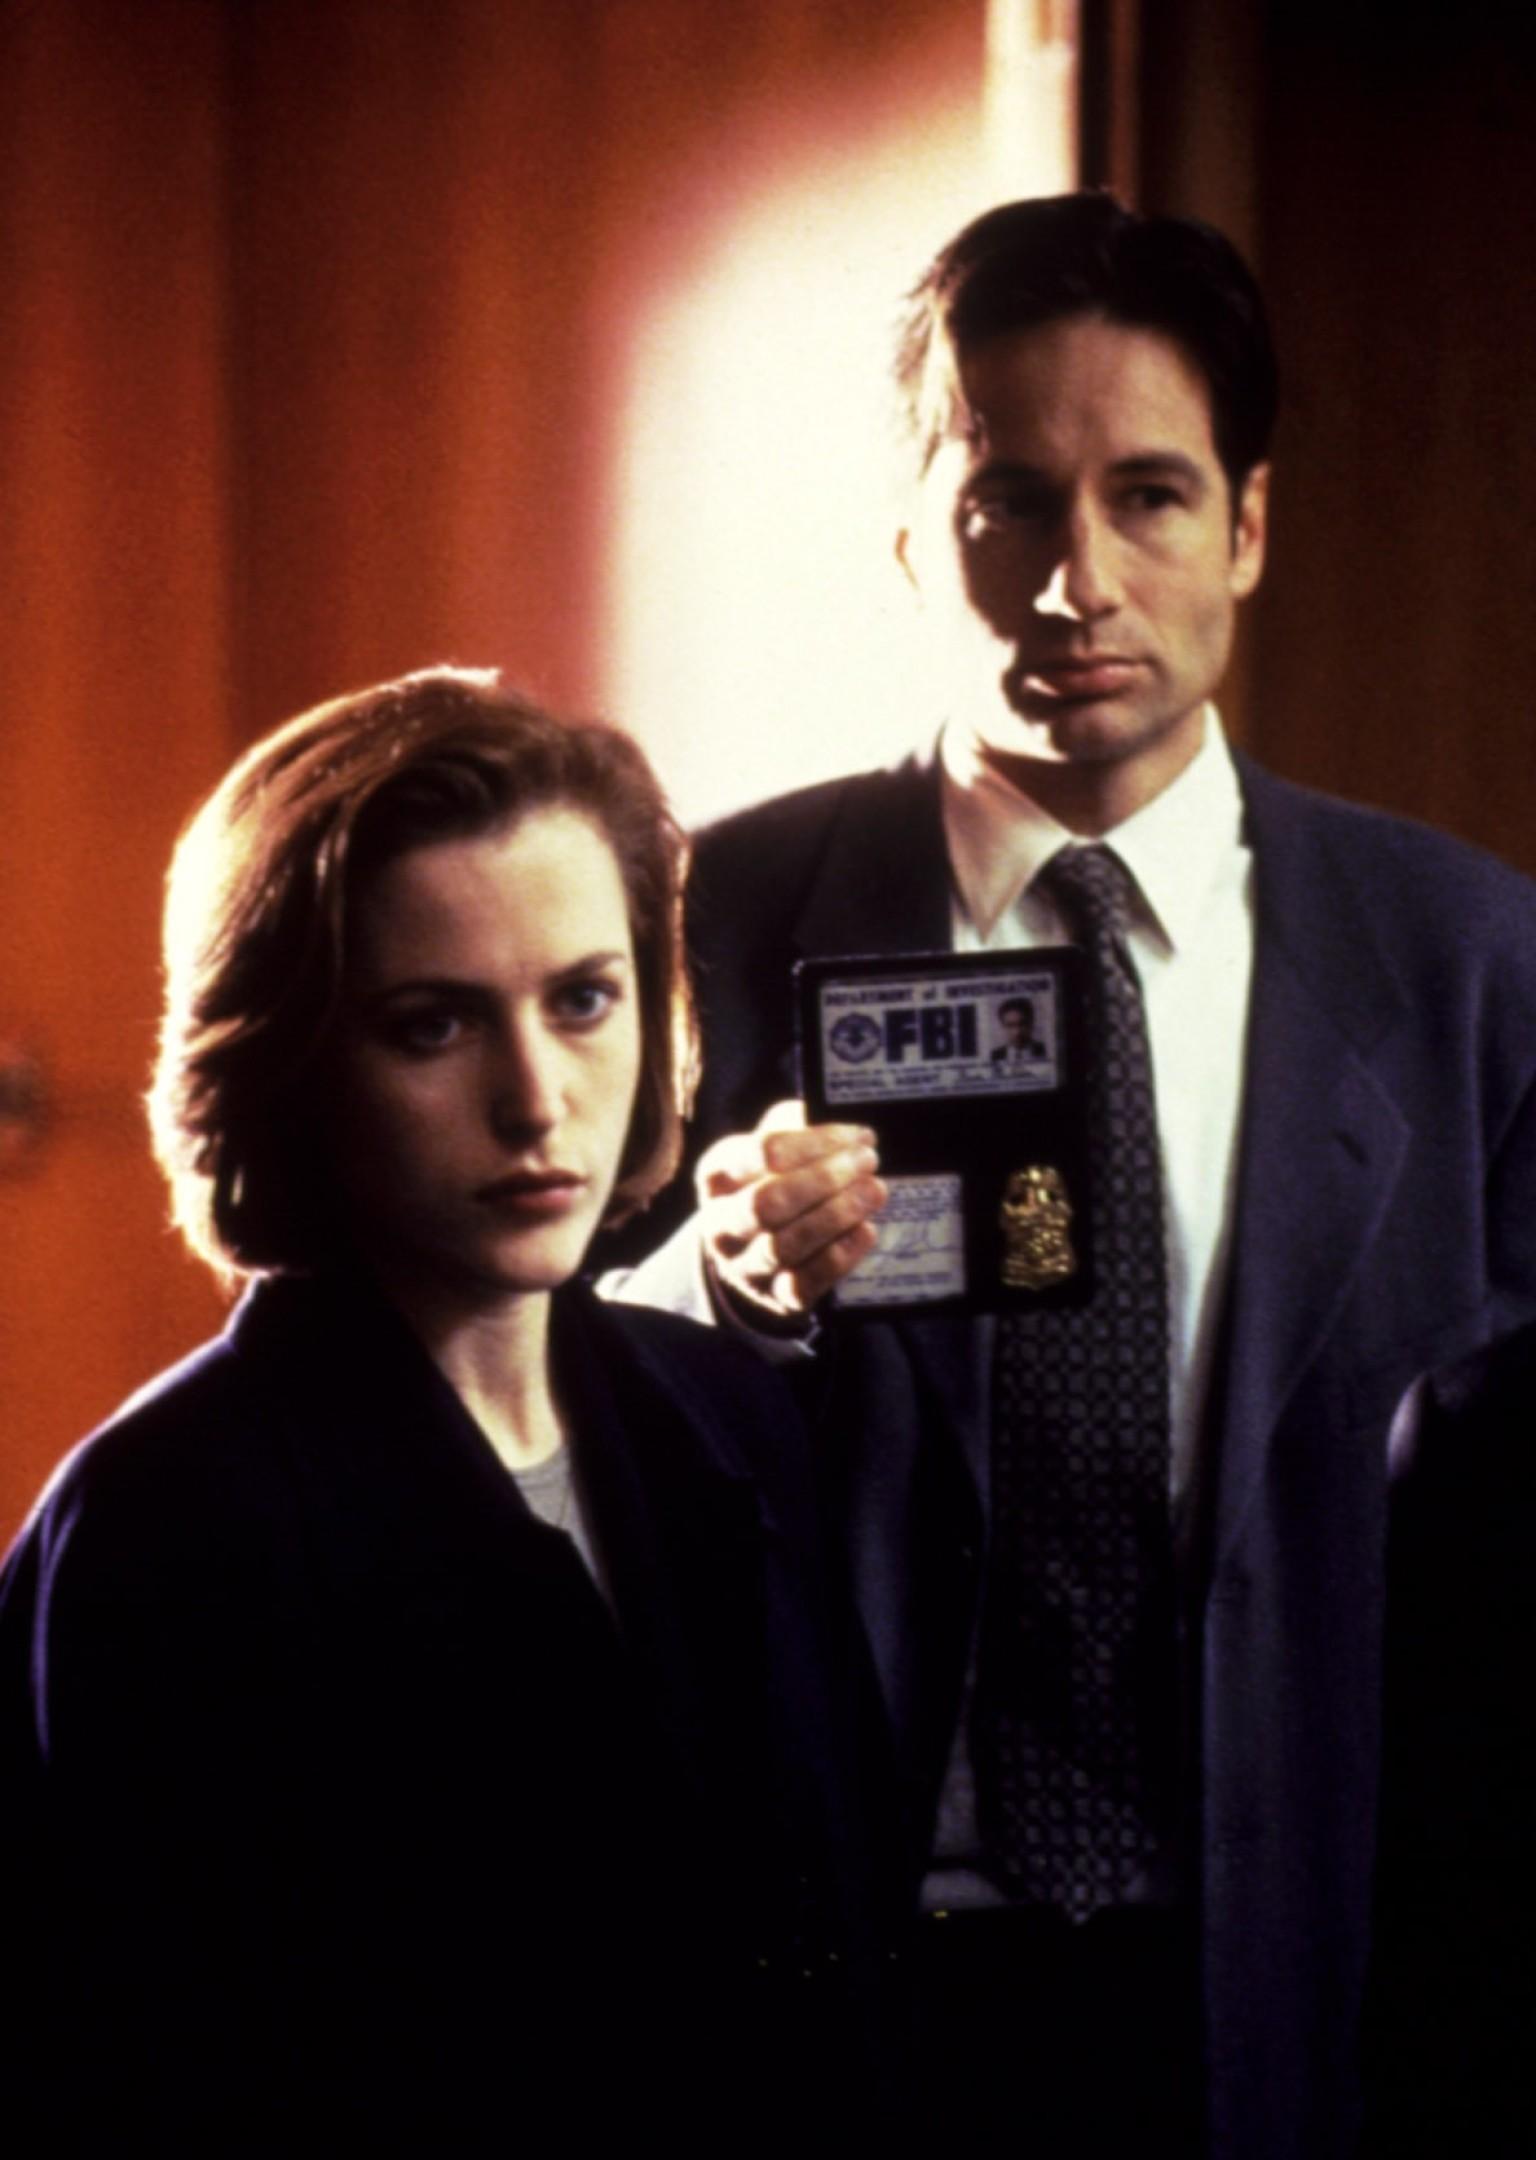 X-Files Cast